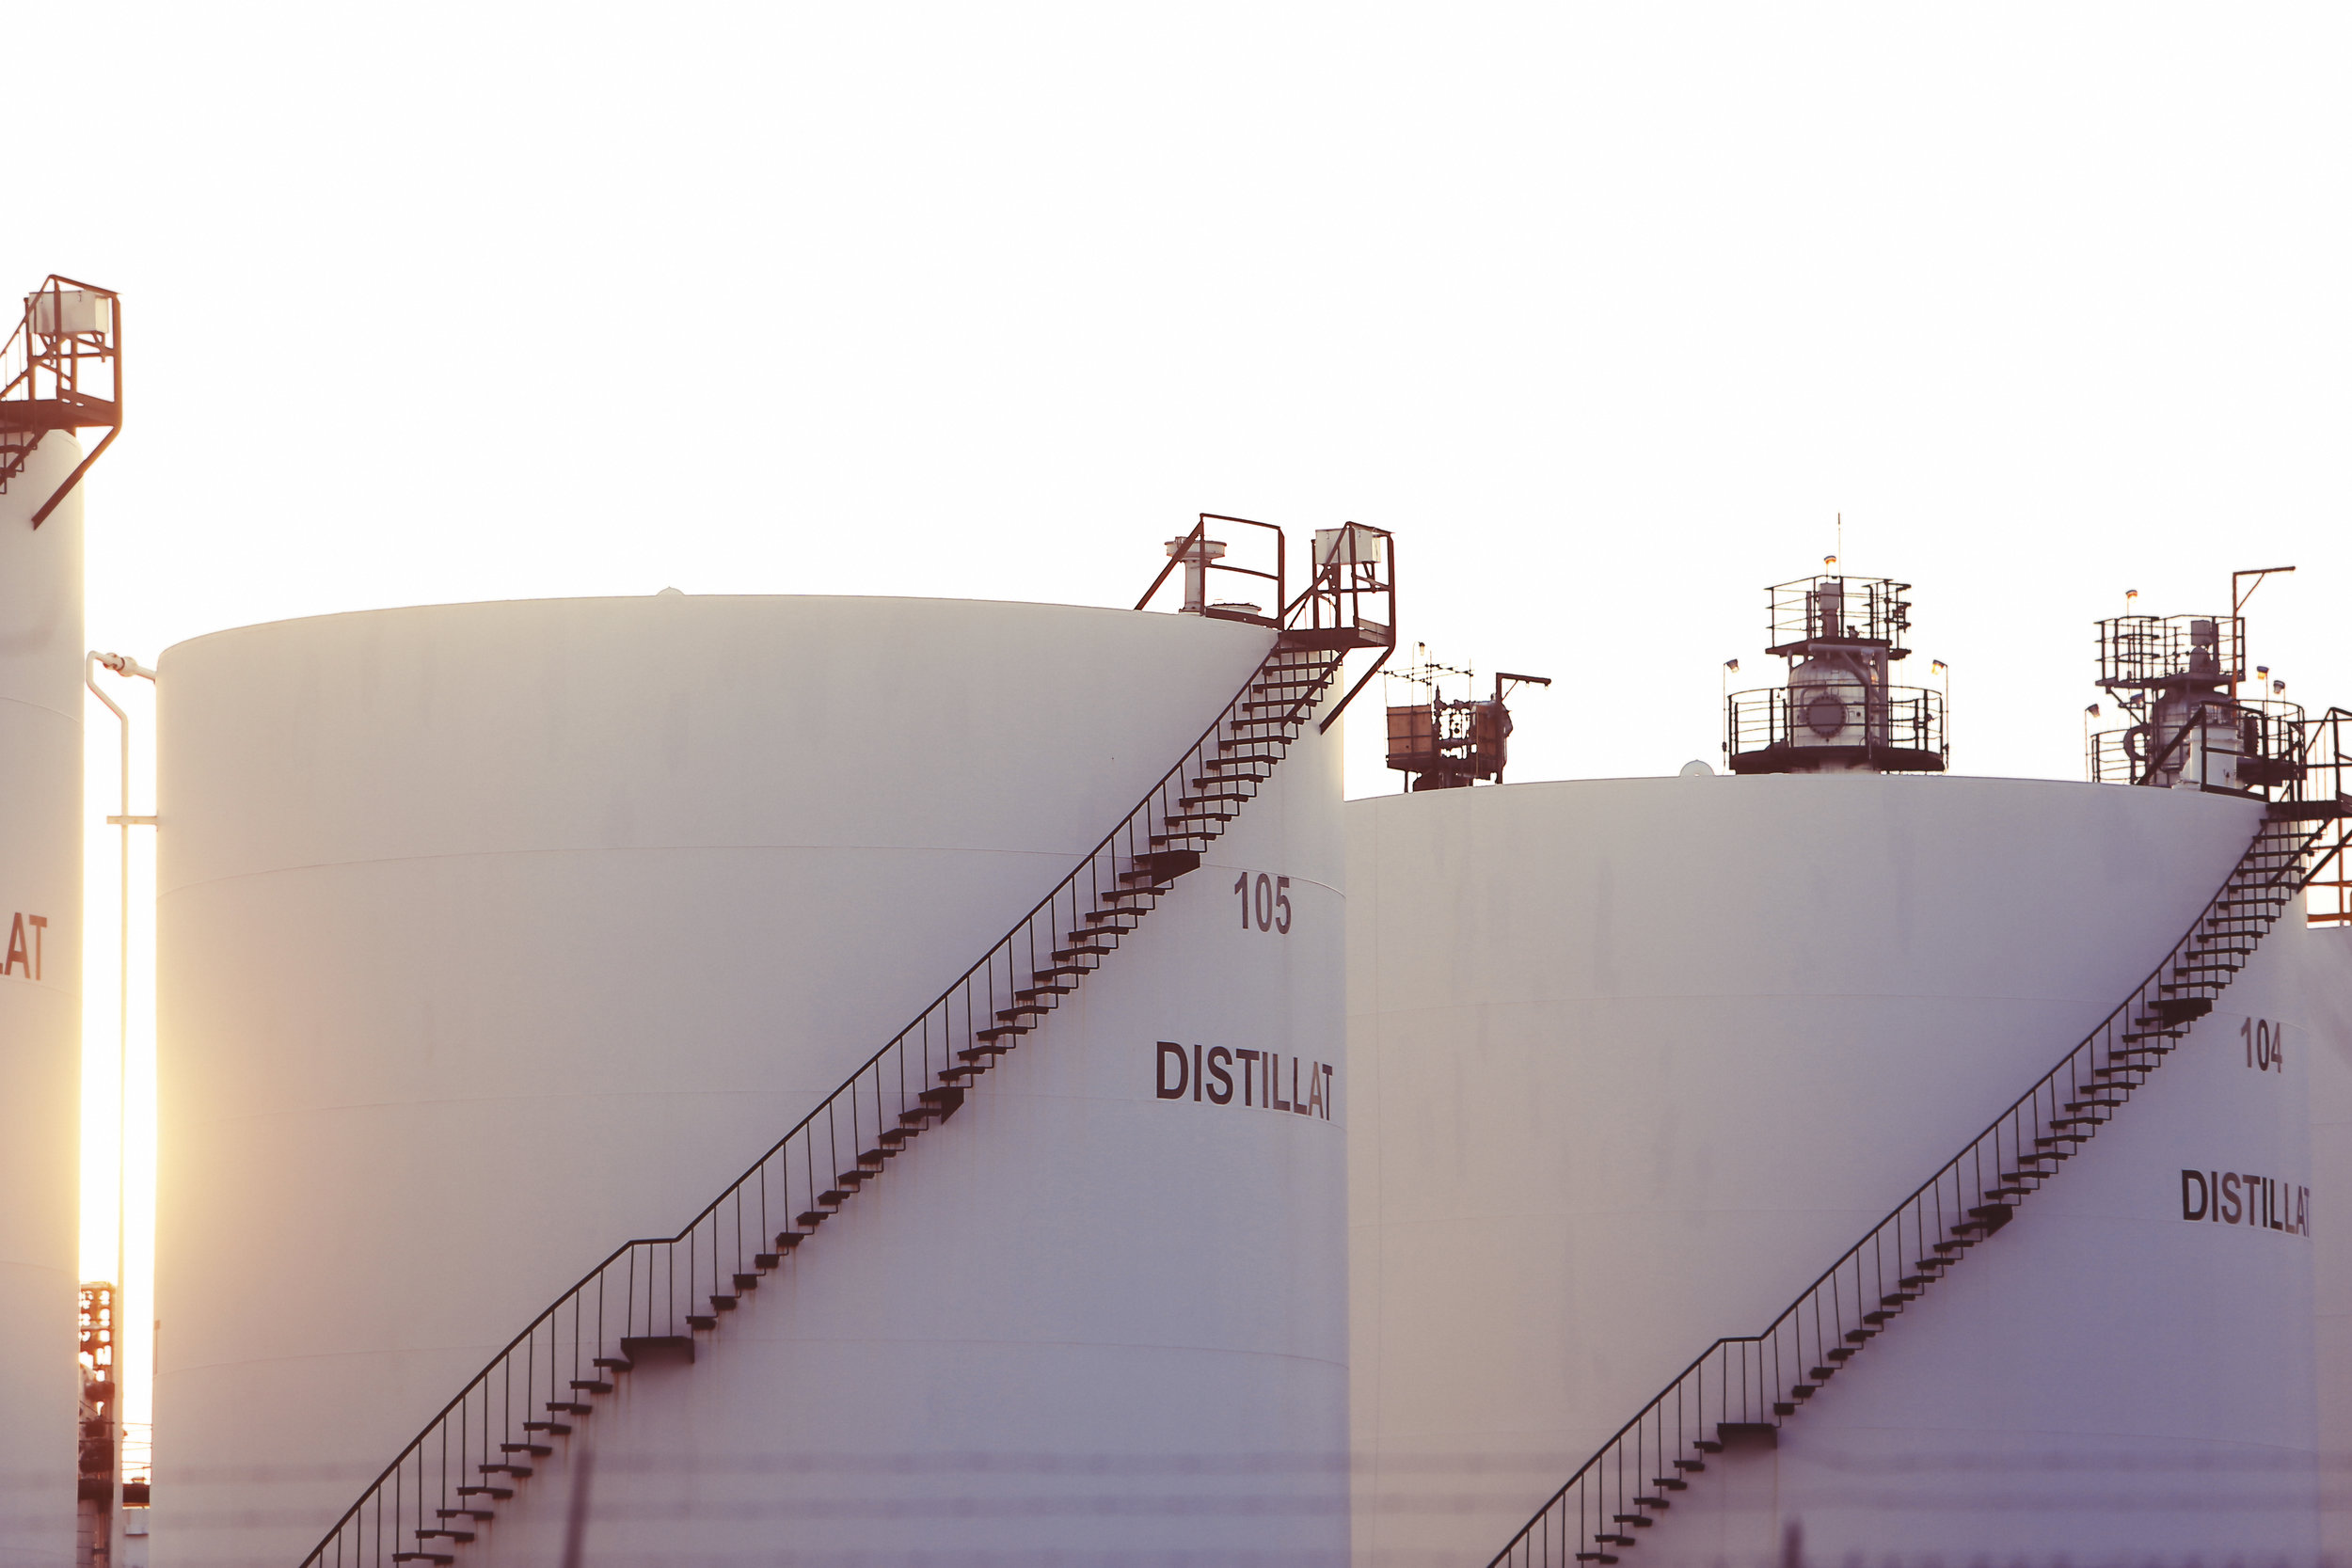 industry-fabric-silos-tanker.jpg